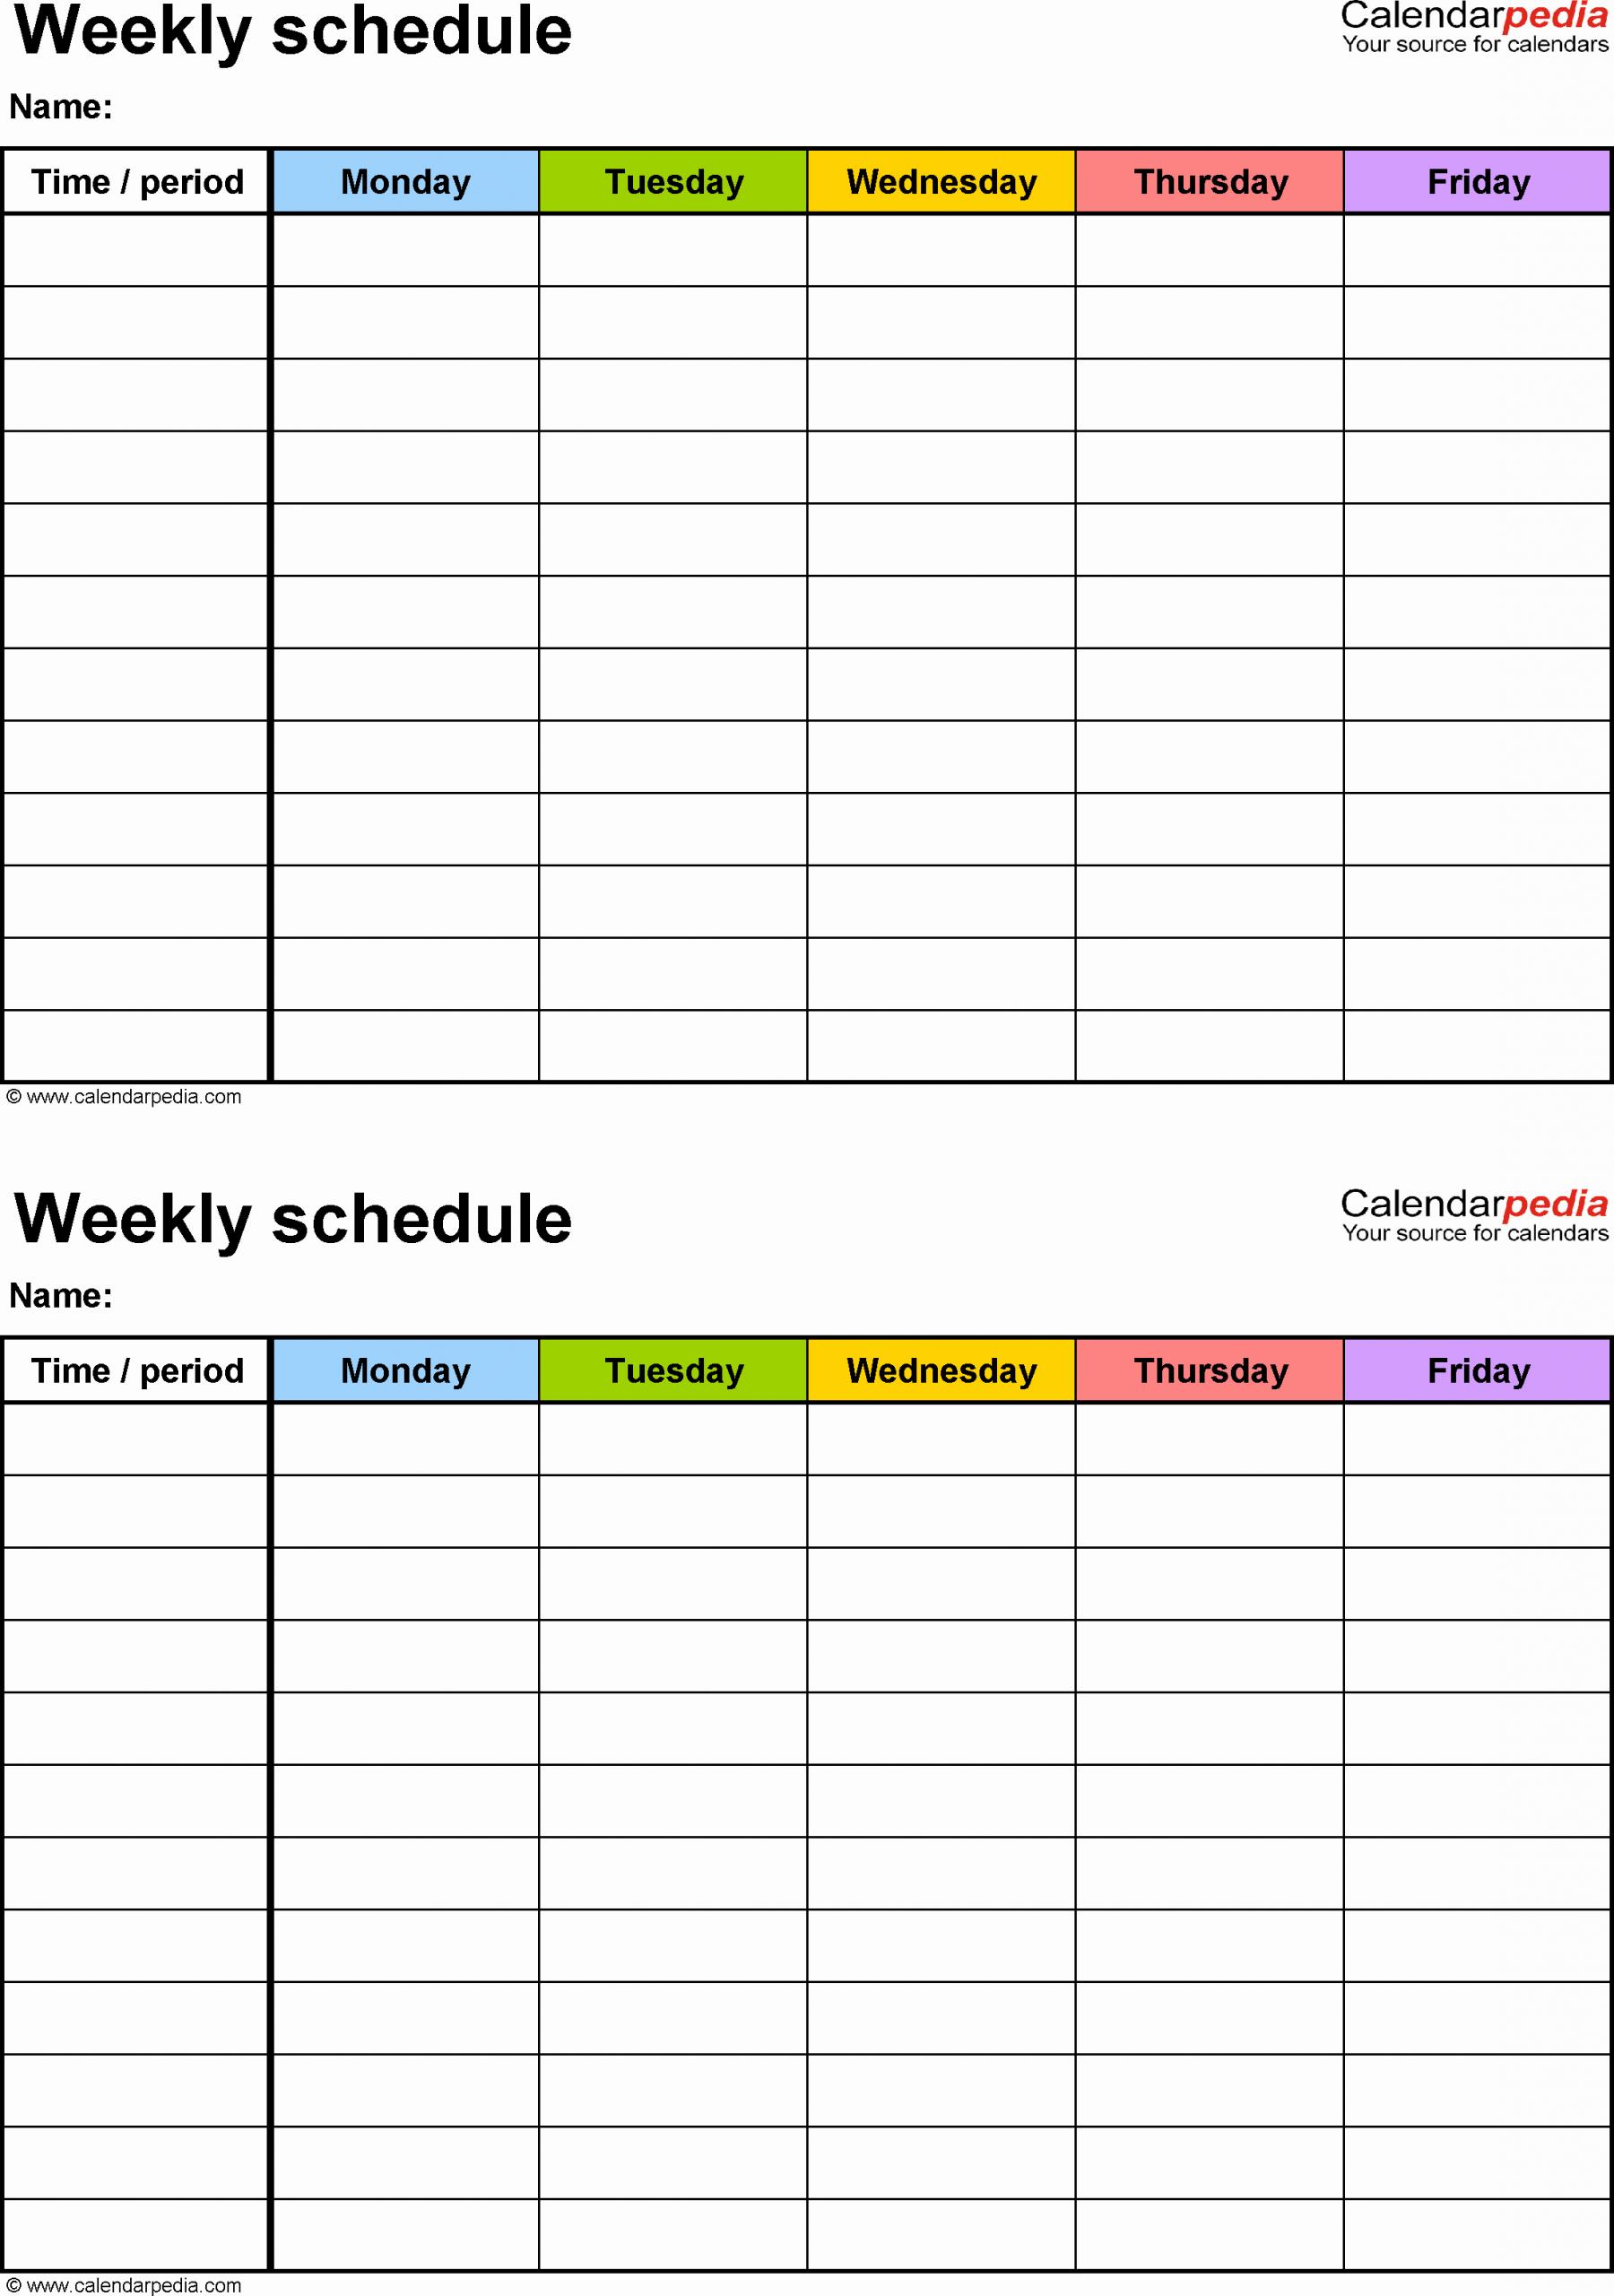 Class Schedule Template Online Luxury Free Weekly Schedule Templates for Pdf 18 Templates